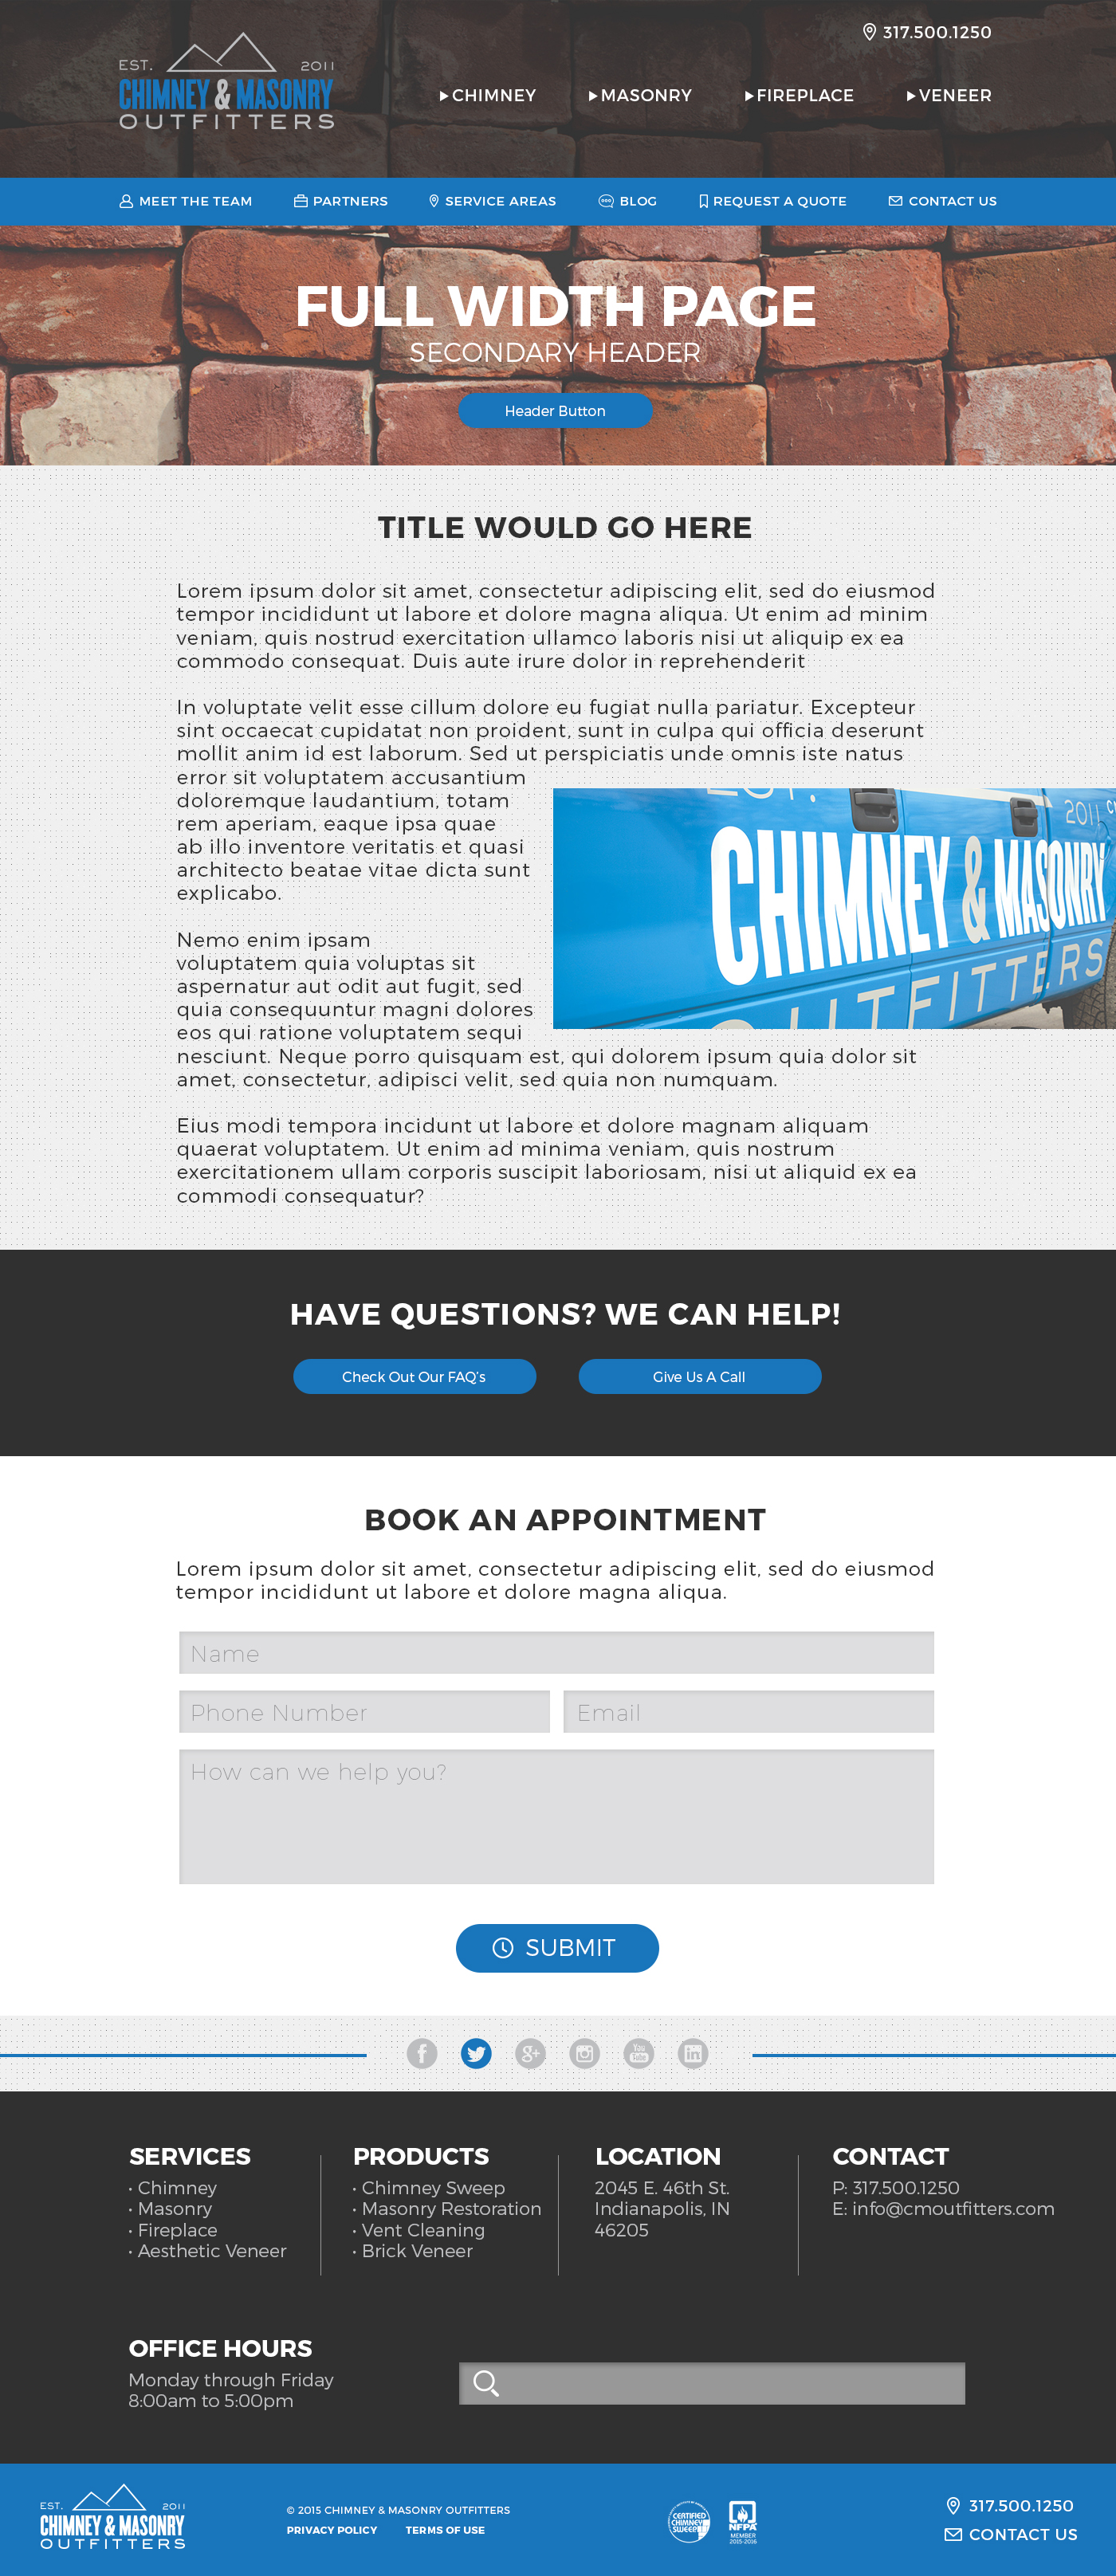 CMO-WebsiteDesign-SecondaryPage-FullWidth.jpg